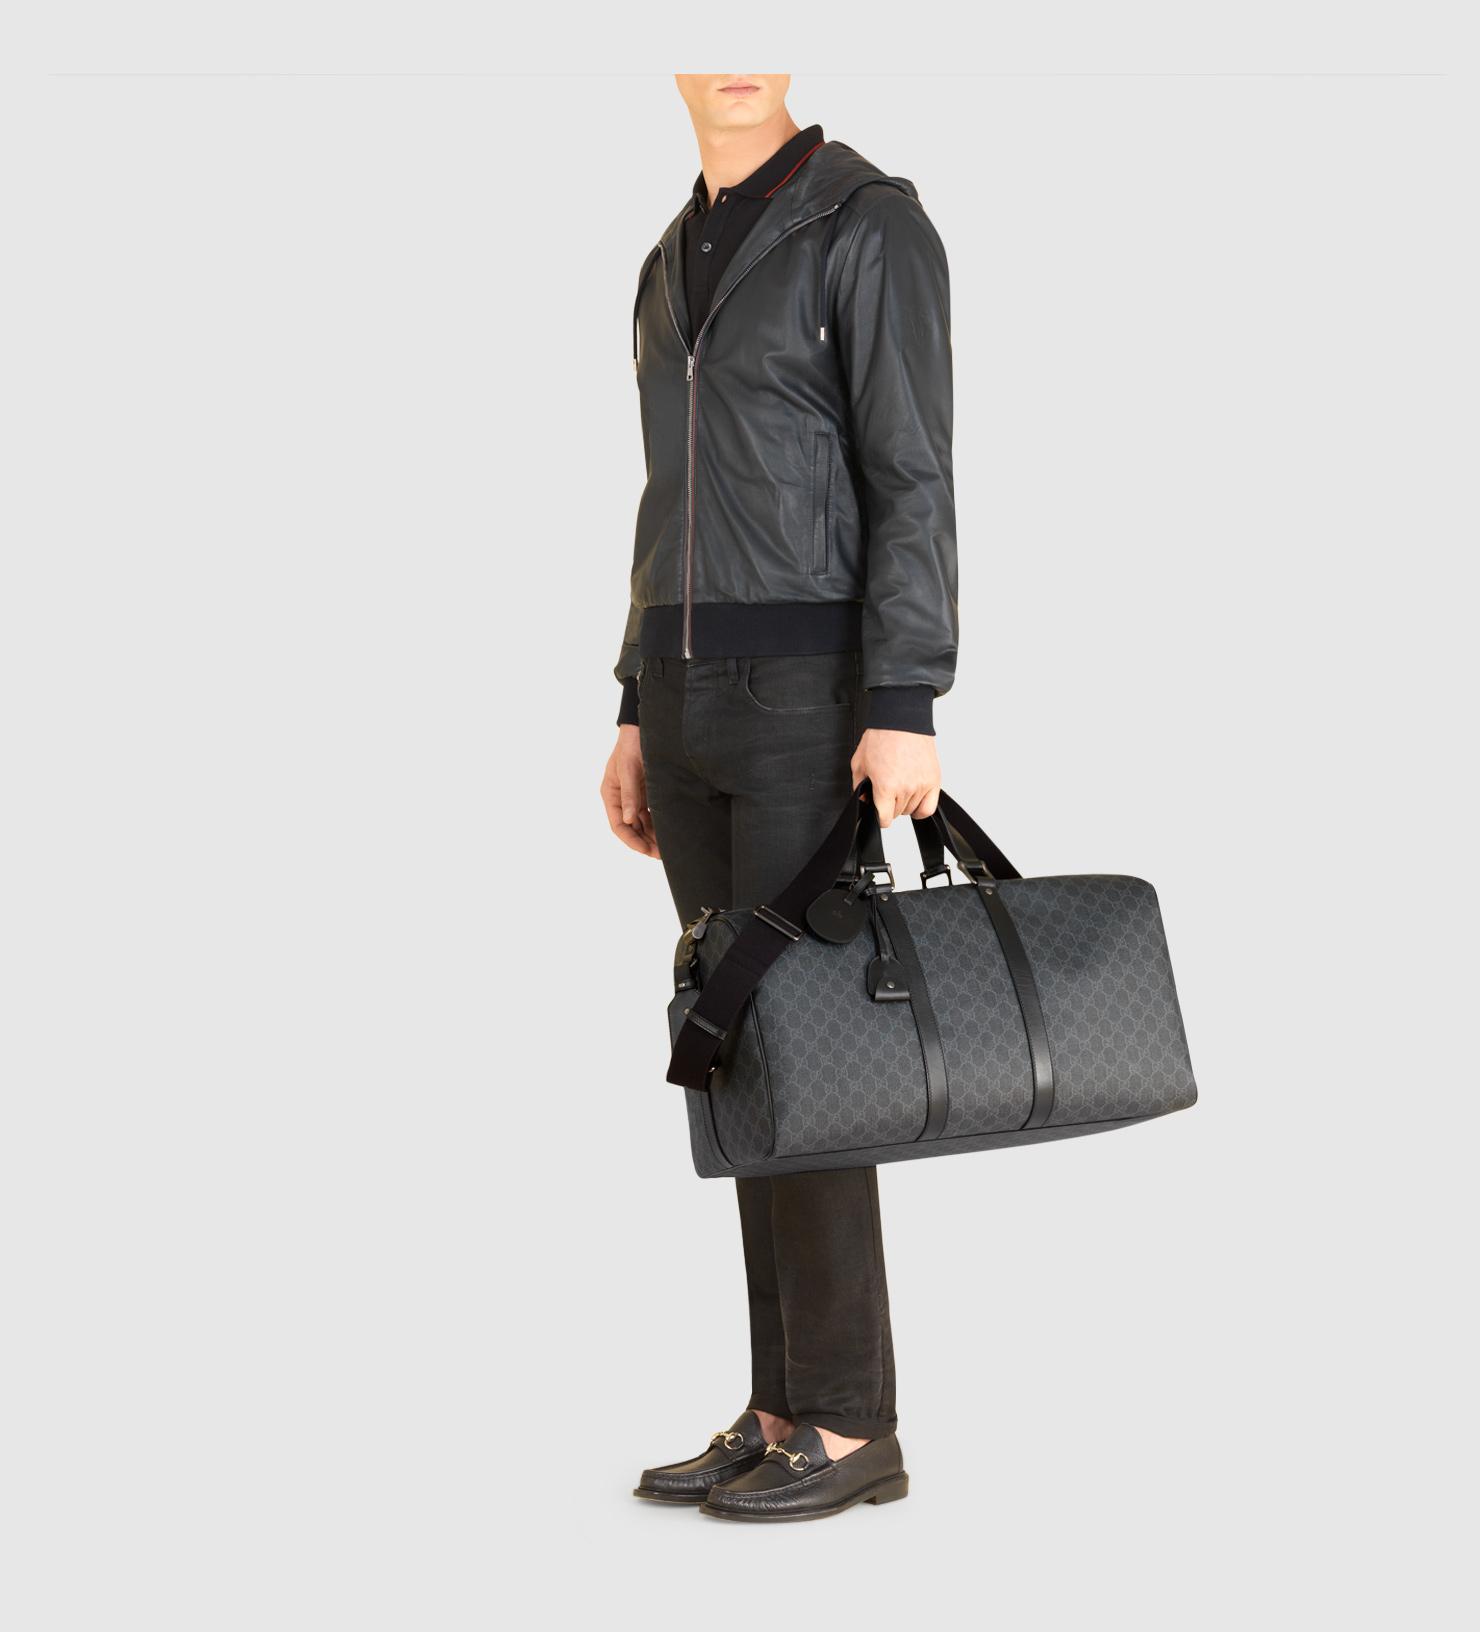 25aed88da Duffle Bags Black Gucci Night Courrier Soft Gg Supreme Carry On Gucci 2way Duffel  Bag Black Techno Canvas ...